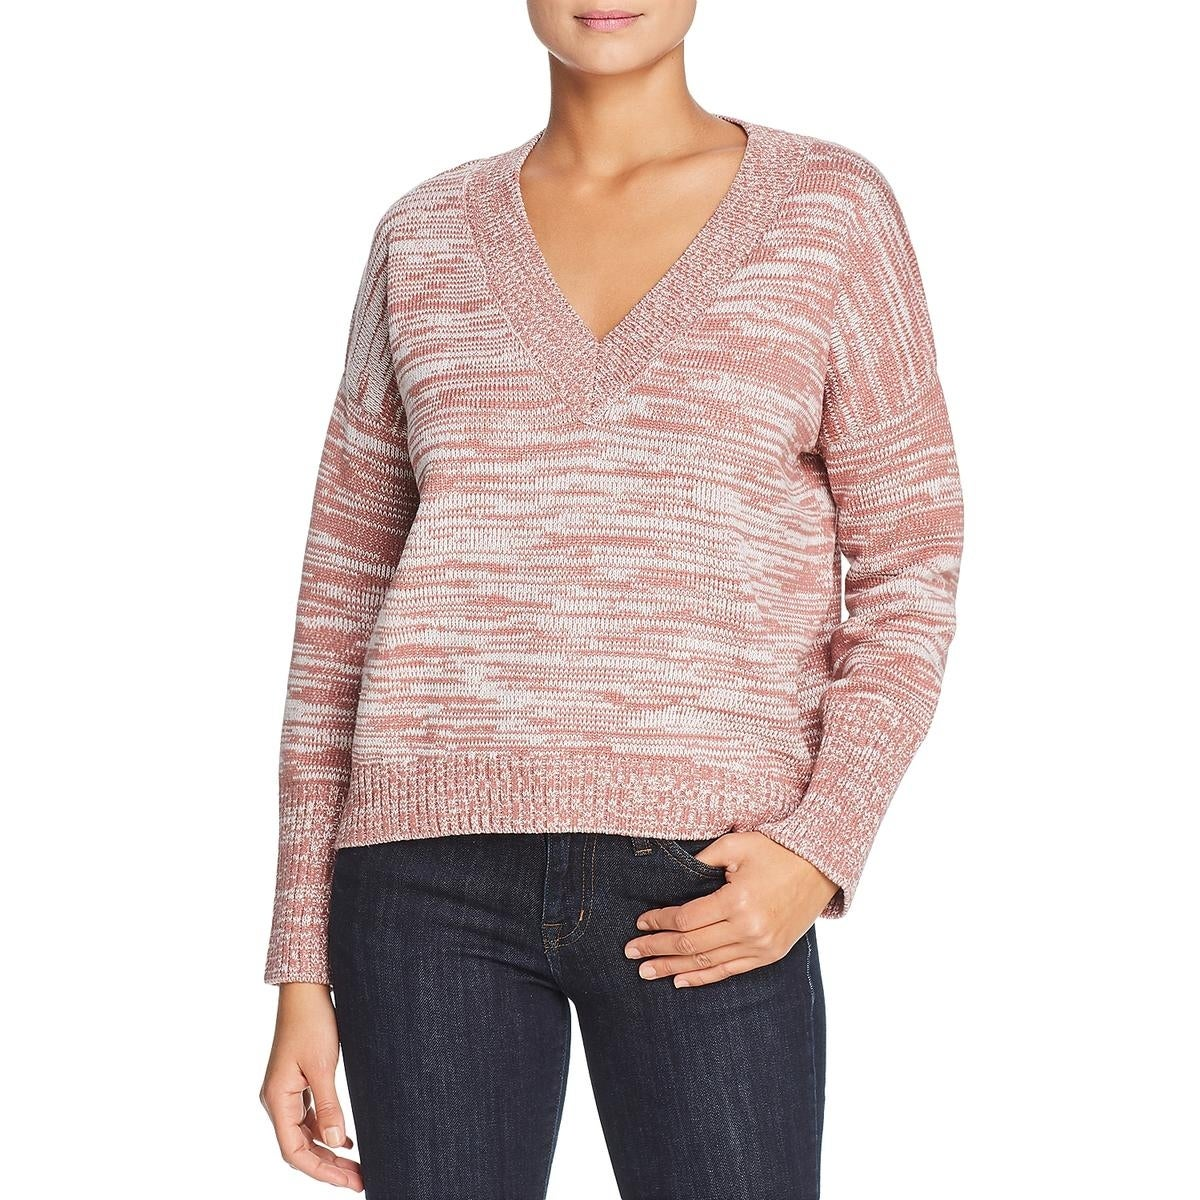 HJHJDAD 100/% Cotton Short Sleeve T-Shirt Design Mens KAWS-T-Shirts